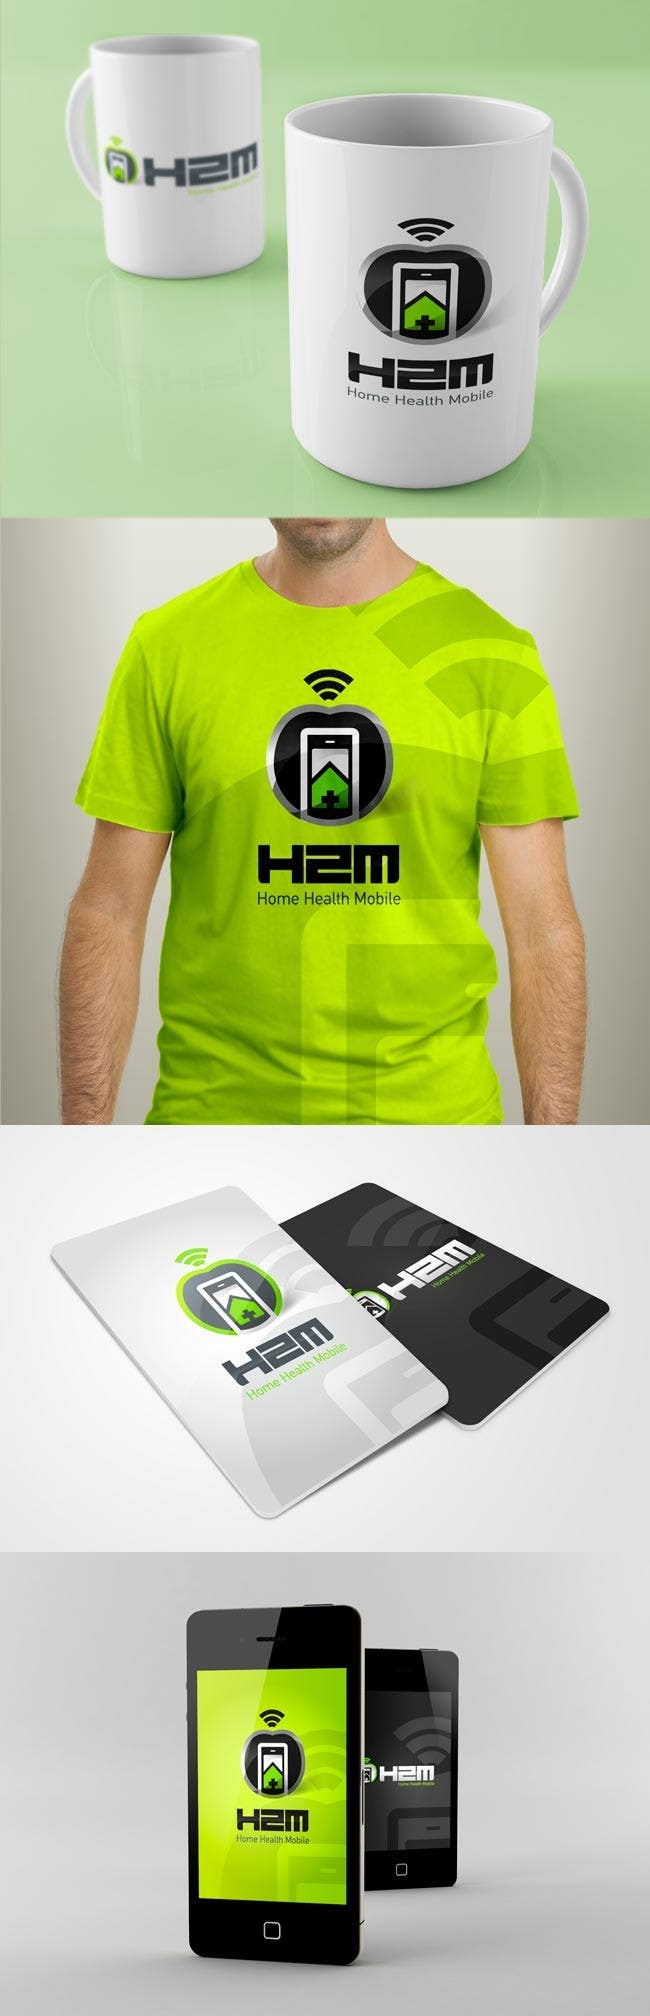 Proposition n°299 du concours Logo Design for Home Health Mobile: Quality assurance